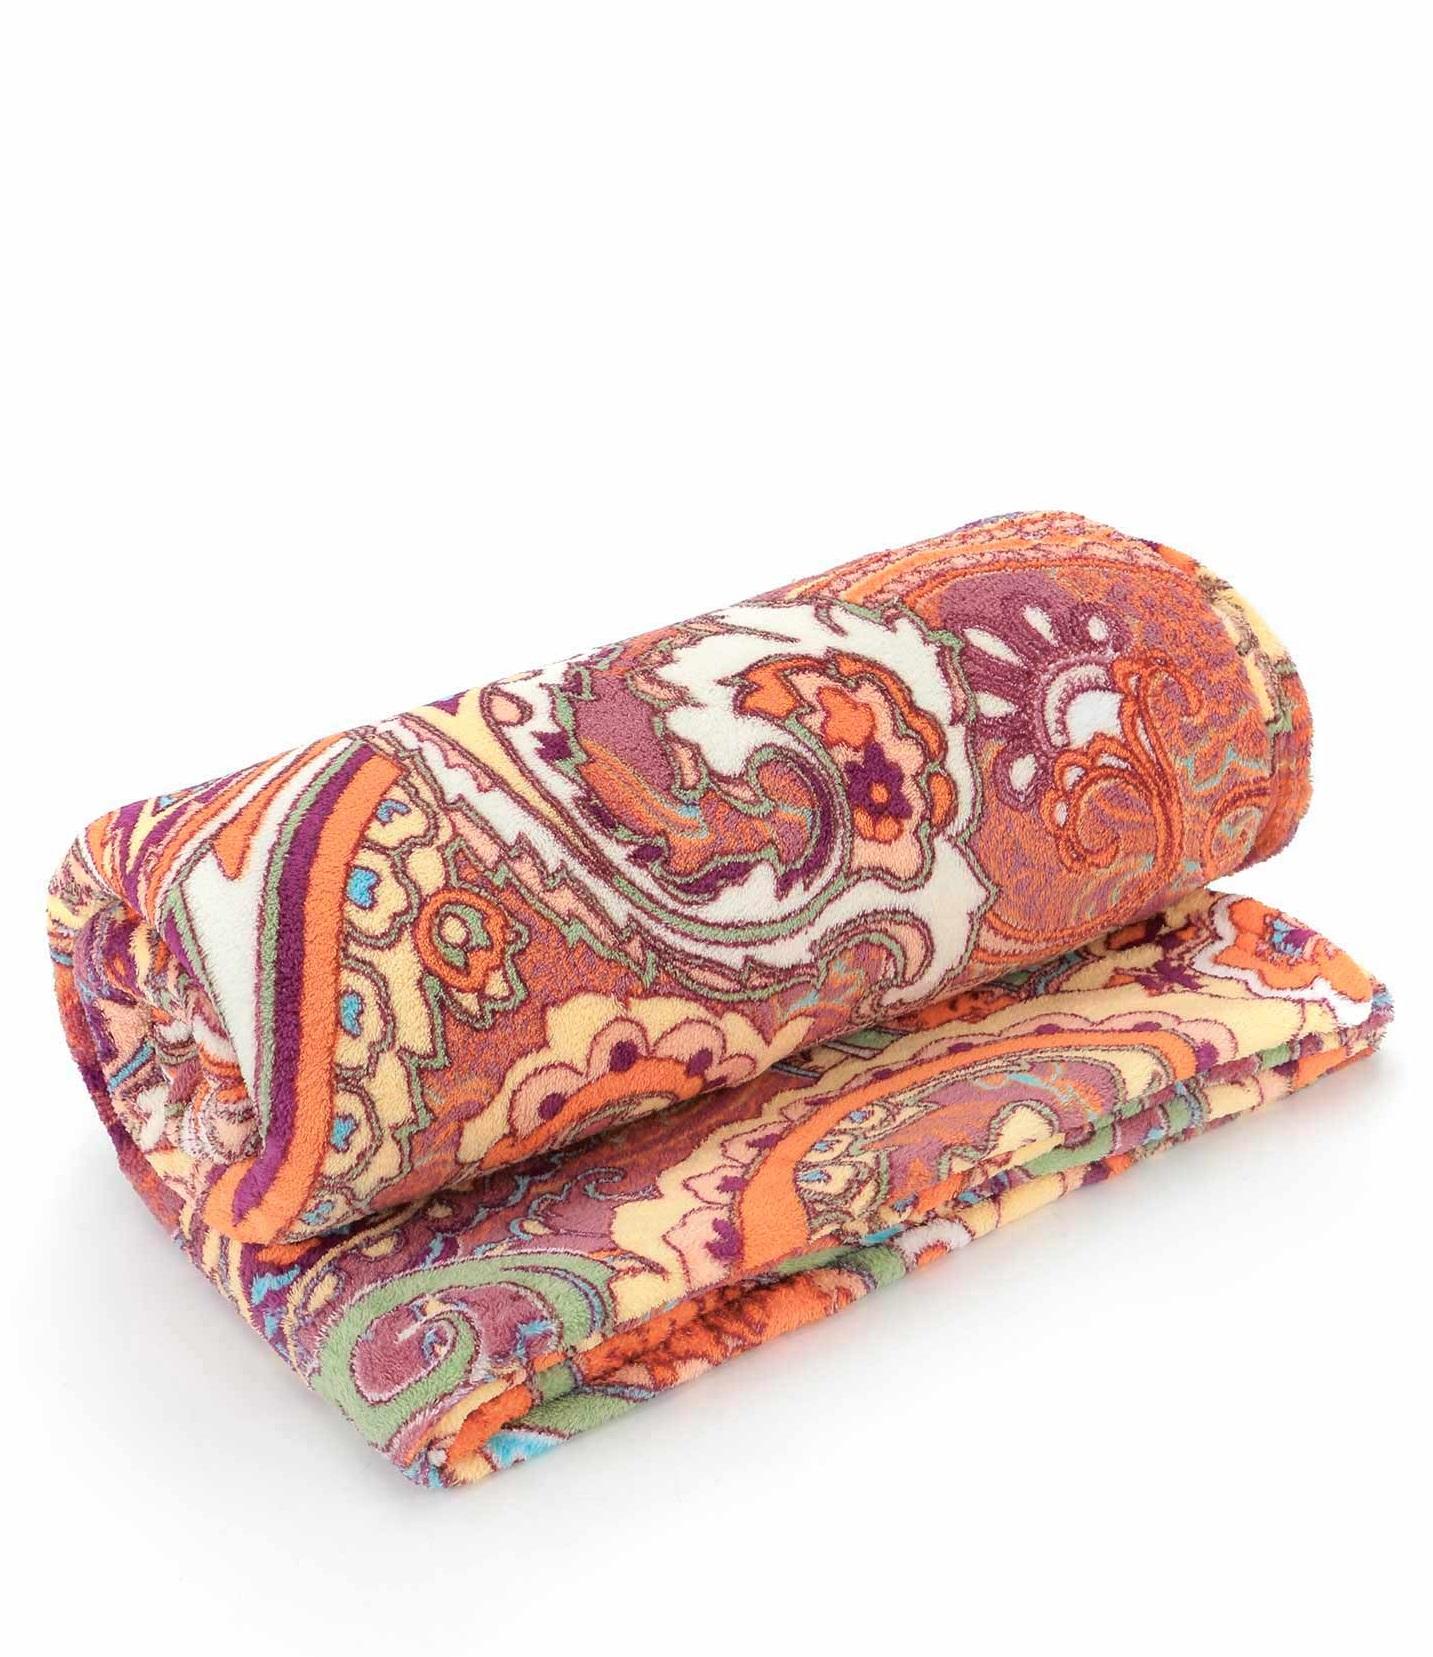 Плед арт. 03-0095 р. 150х200Покрывала, пледы и коврики<br>Плотность ткани:270 г/кв. м<br><br>Тип: Плед<br>Размер: 150х200<br>Материал: Велсофт